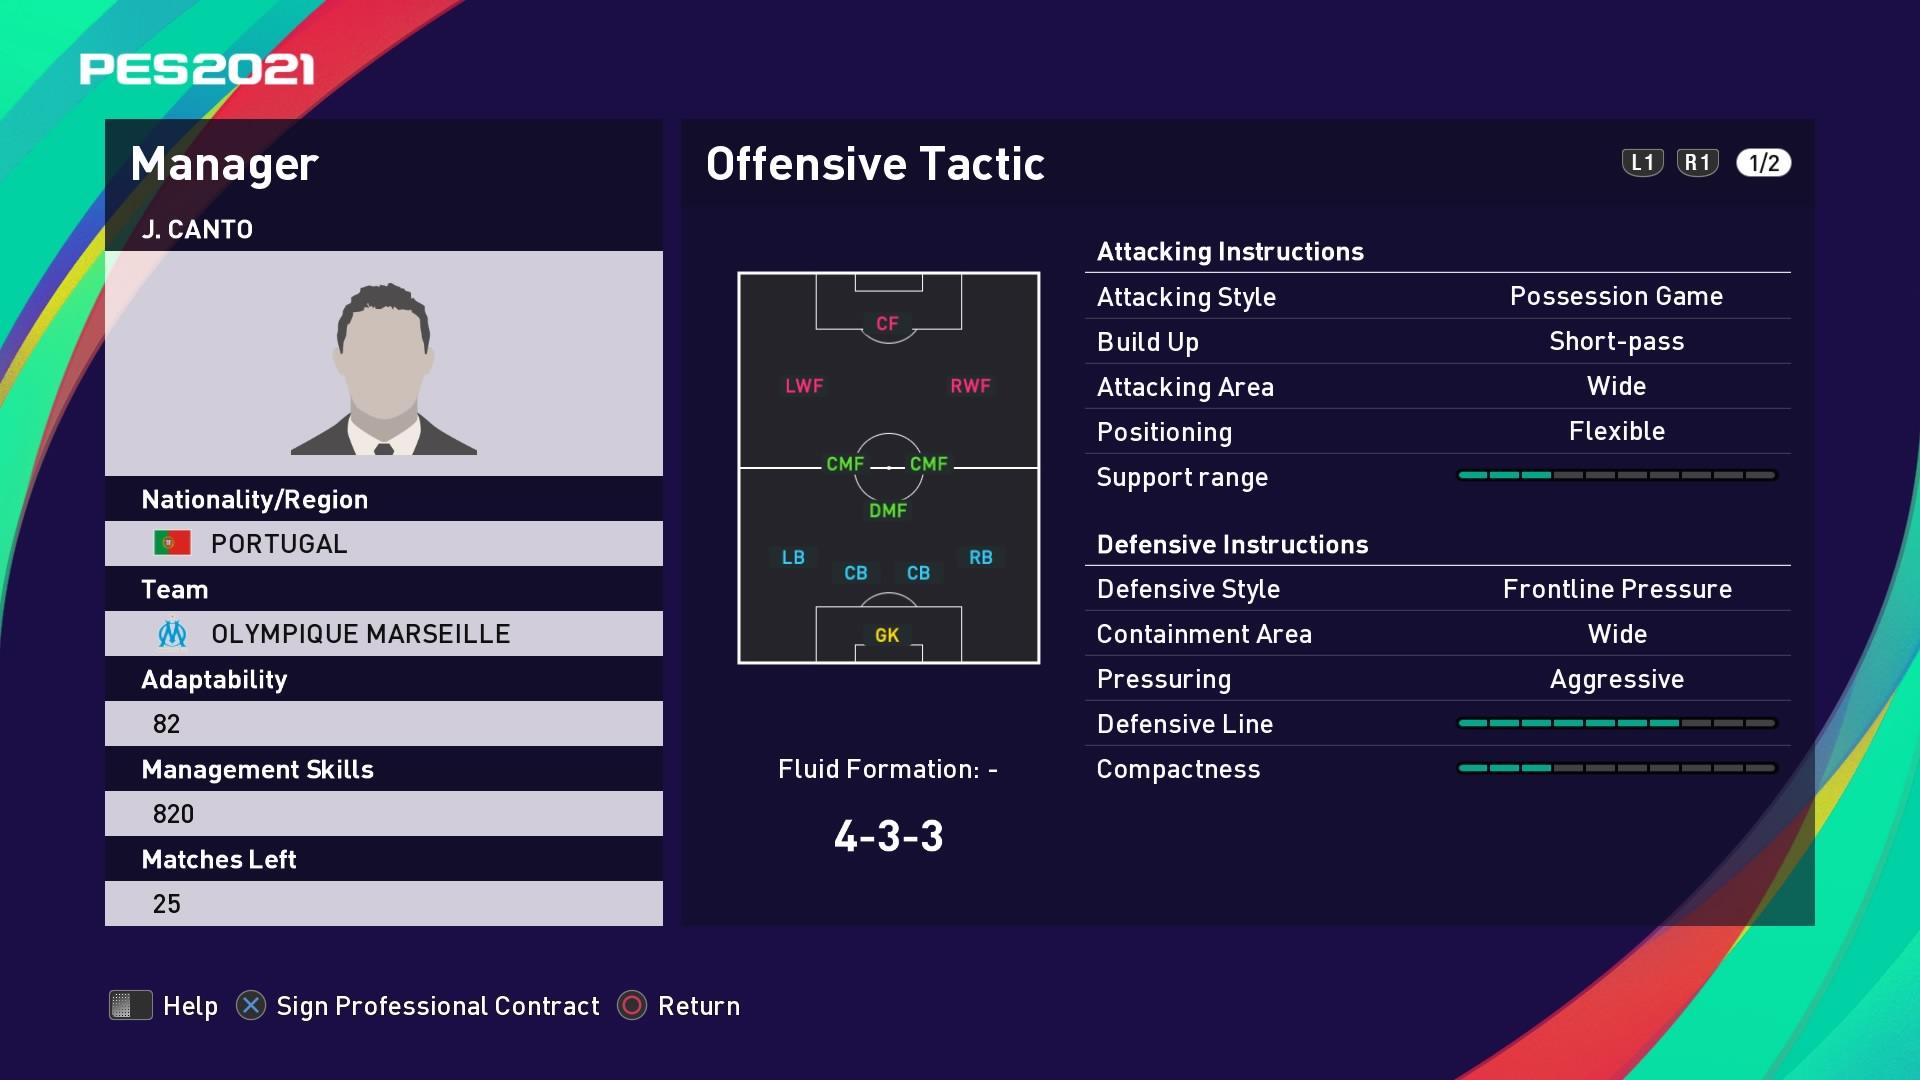 J. Canto (André Villas-Boas) Offensive Tactic in PES 2021 myClub